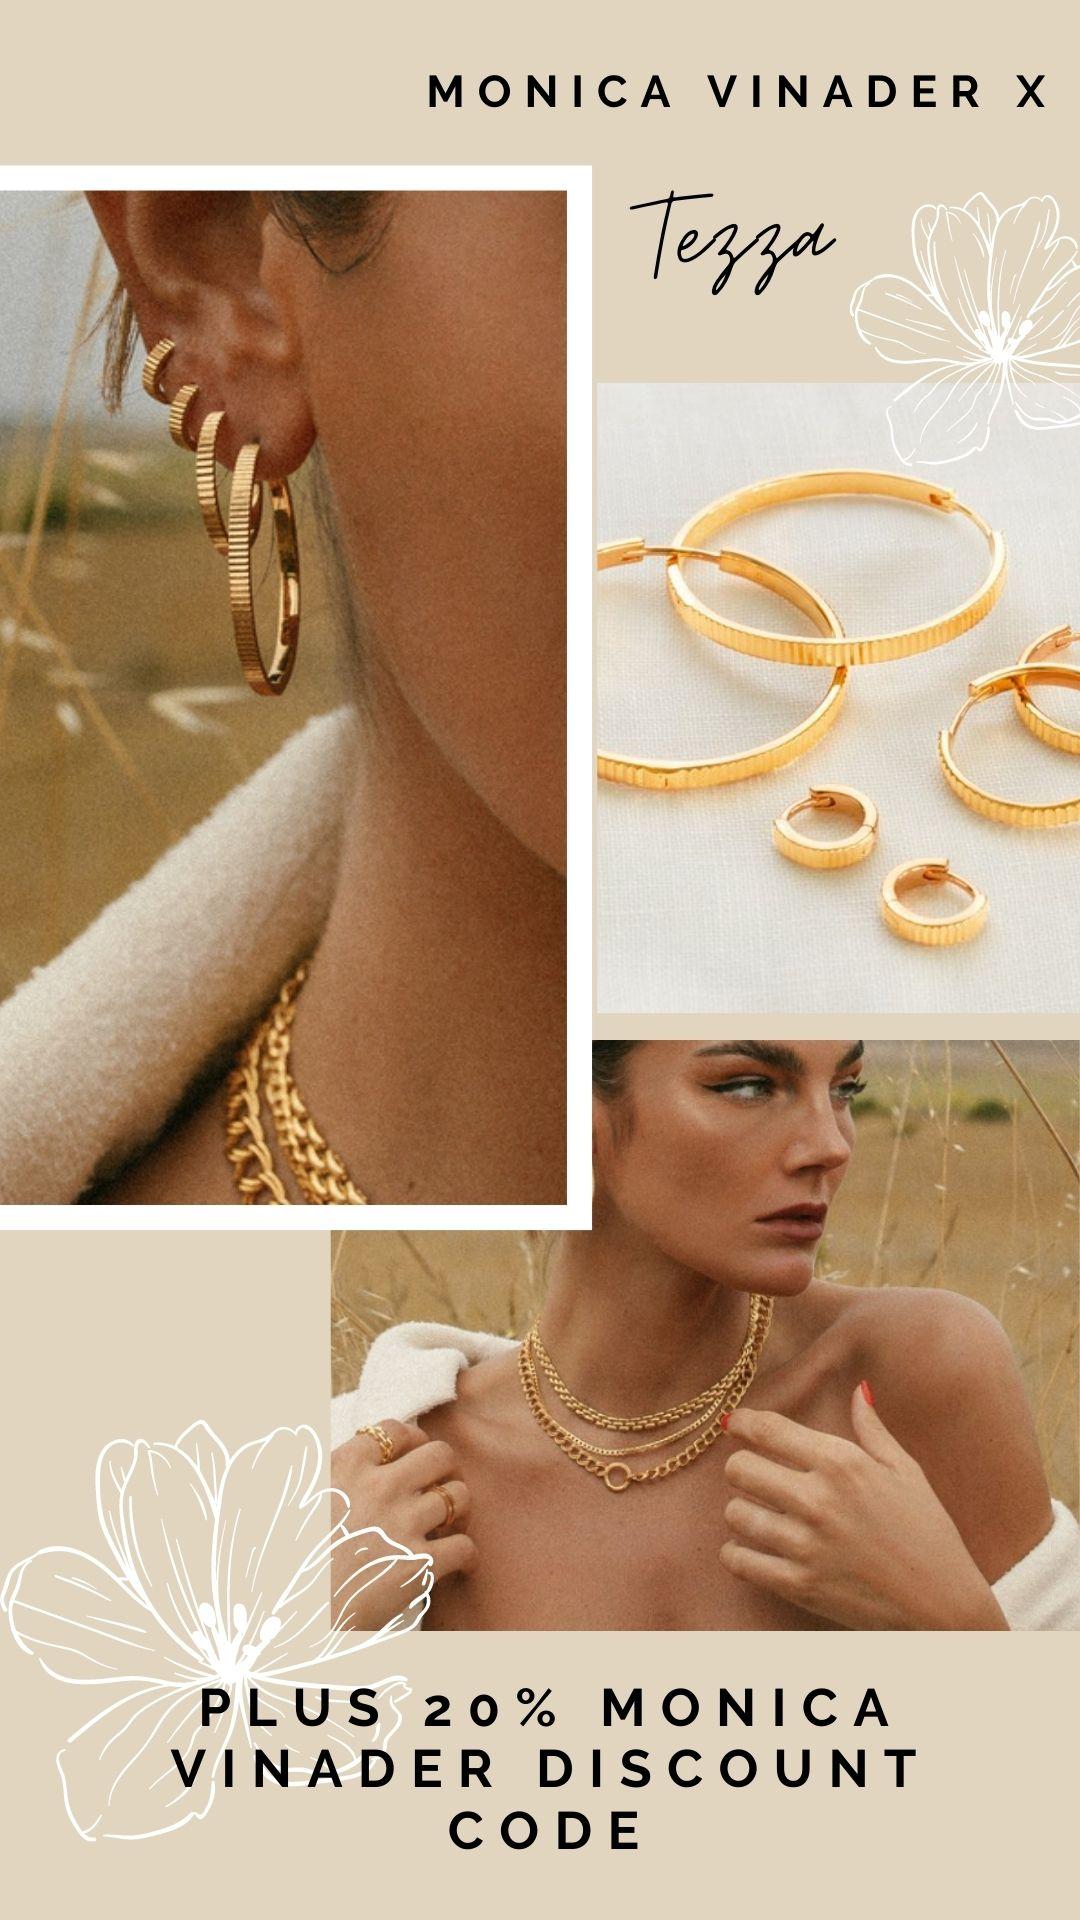 Monica Vinader X Tezza Autumn Edit! + 20% Discount Code! jewellery review pinterest